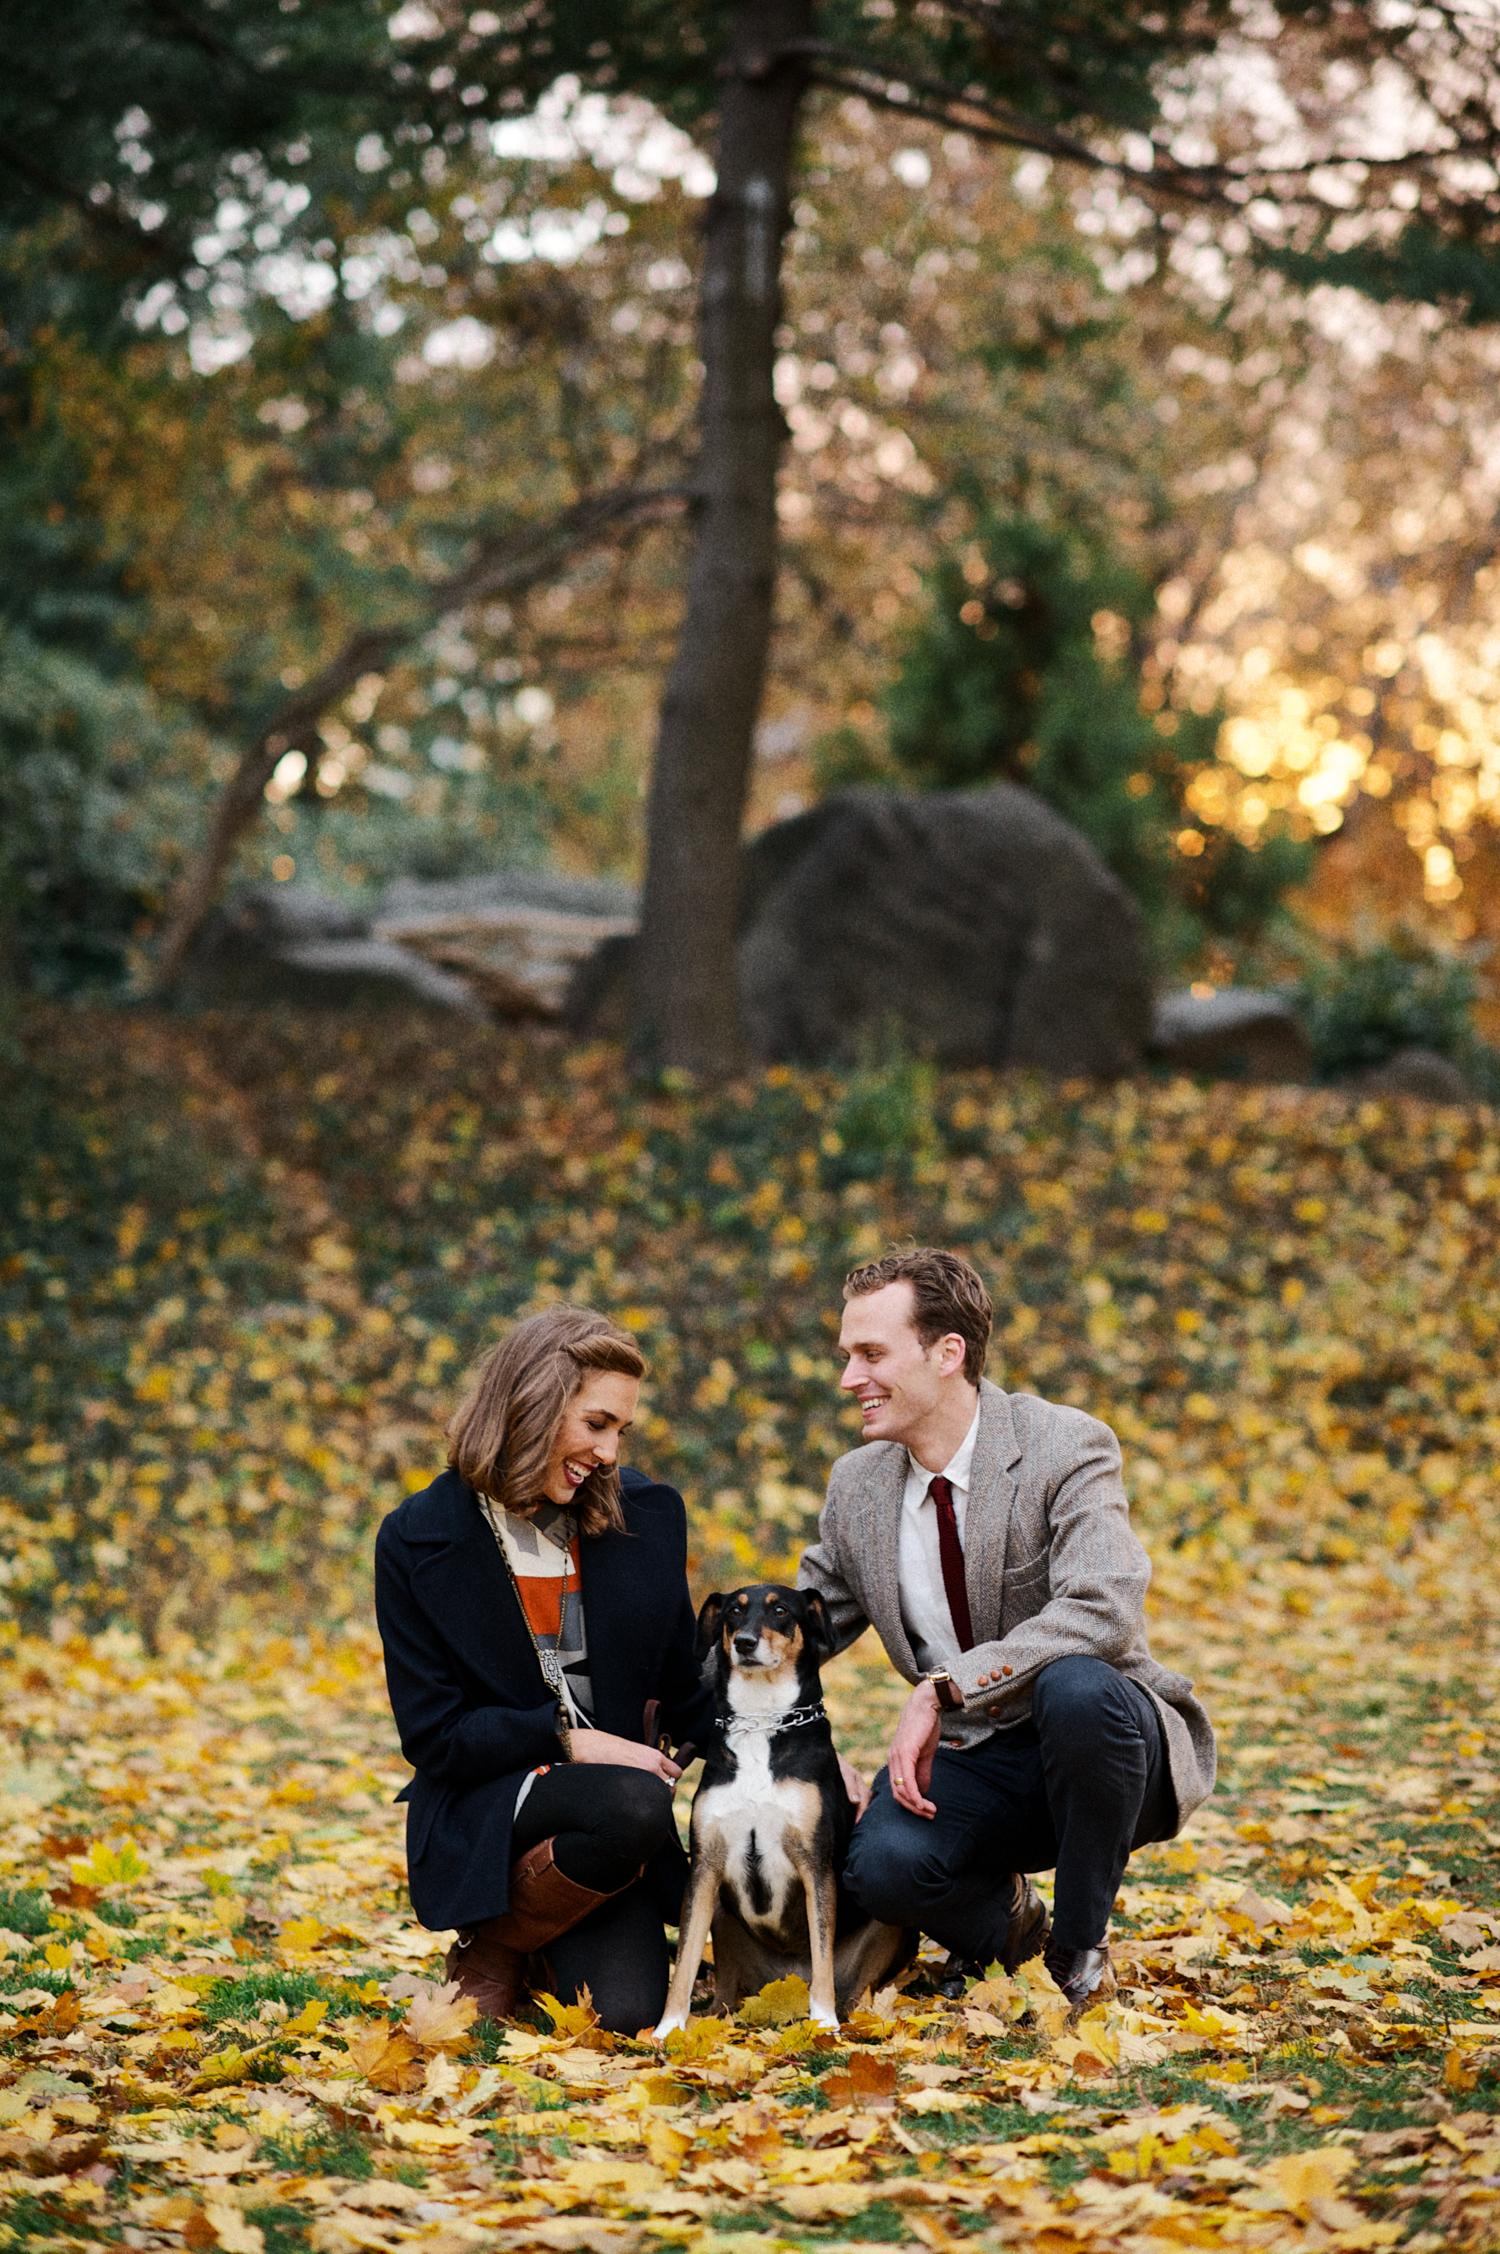 Central.Park.Manhattan.Engagements.A5.jpg